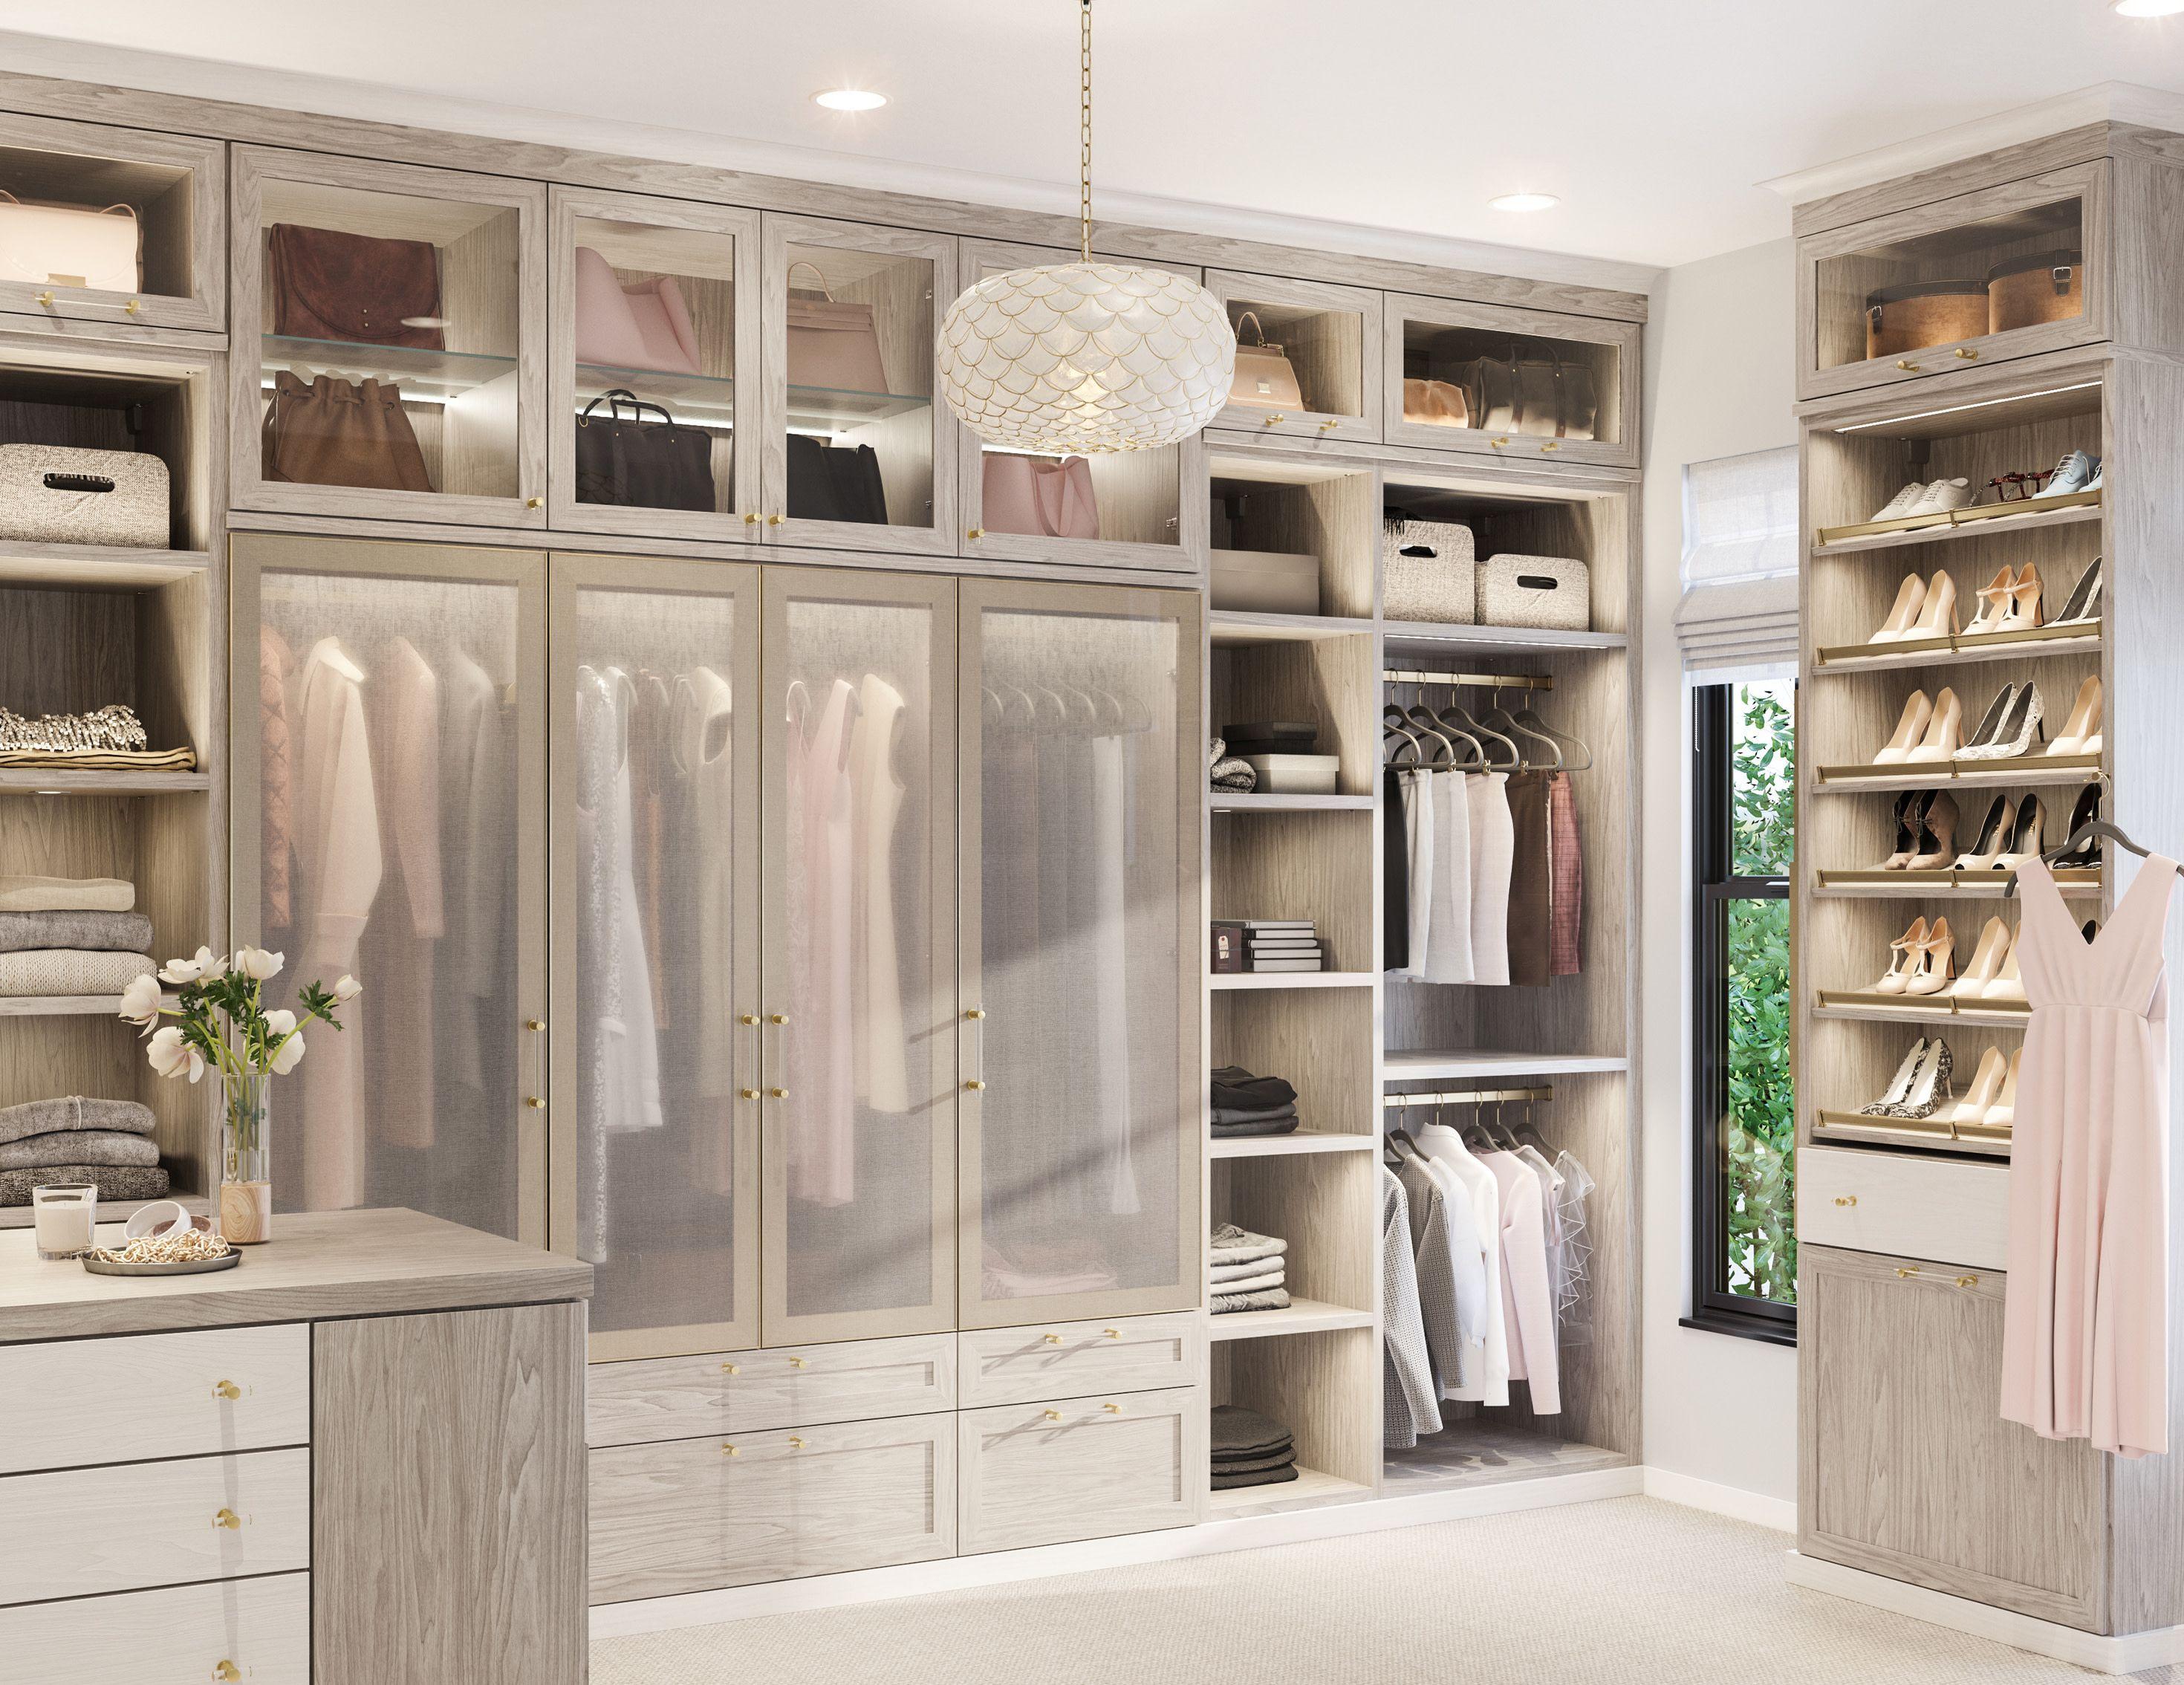 Custom Closet Designs & Systems in Vancouver  California Closets